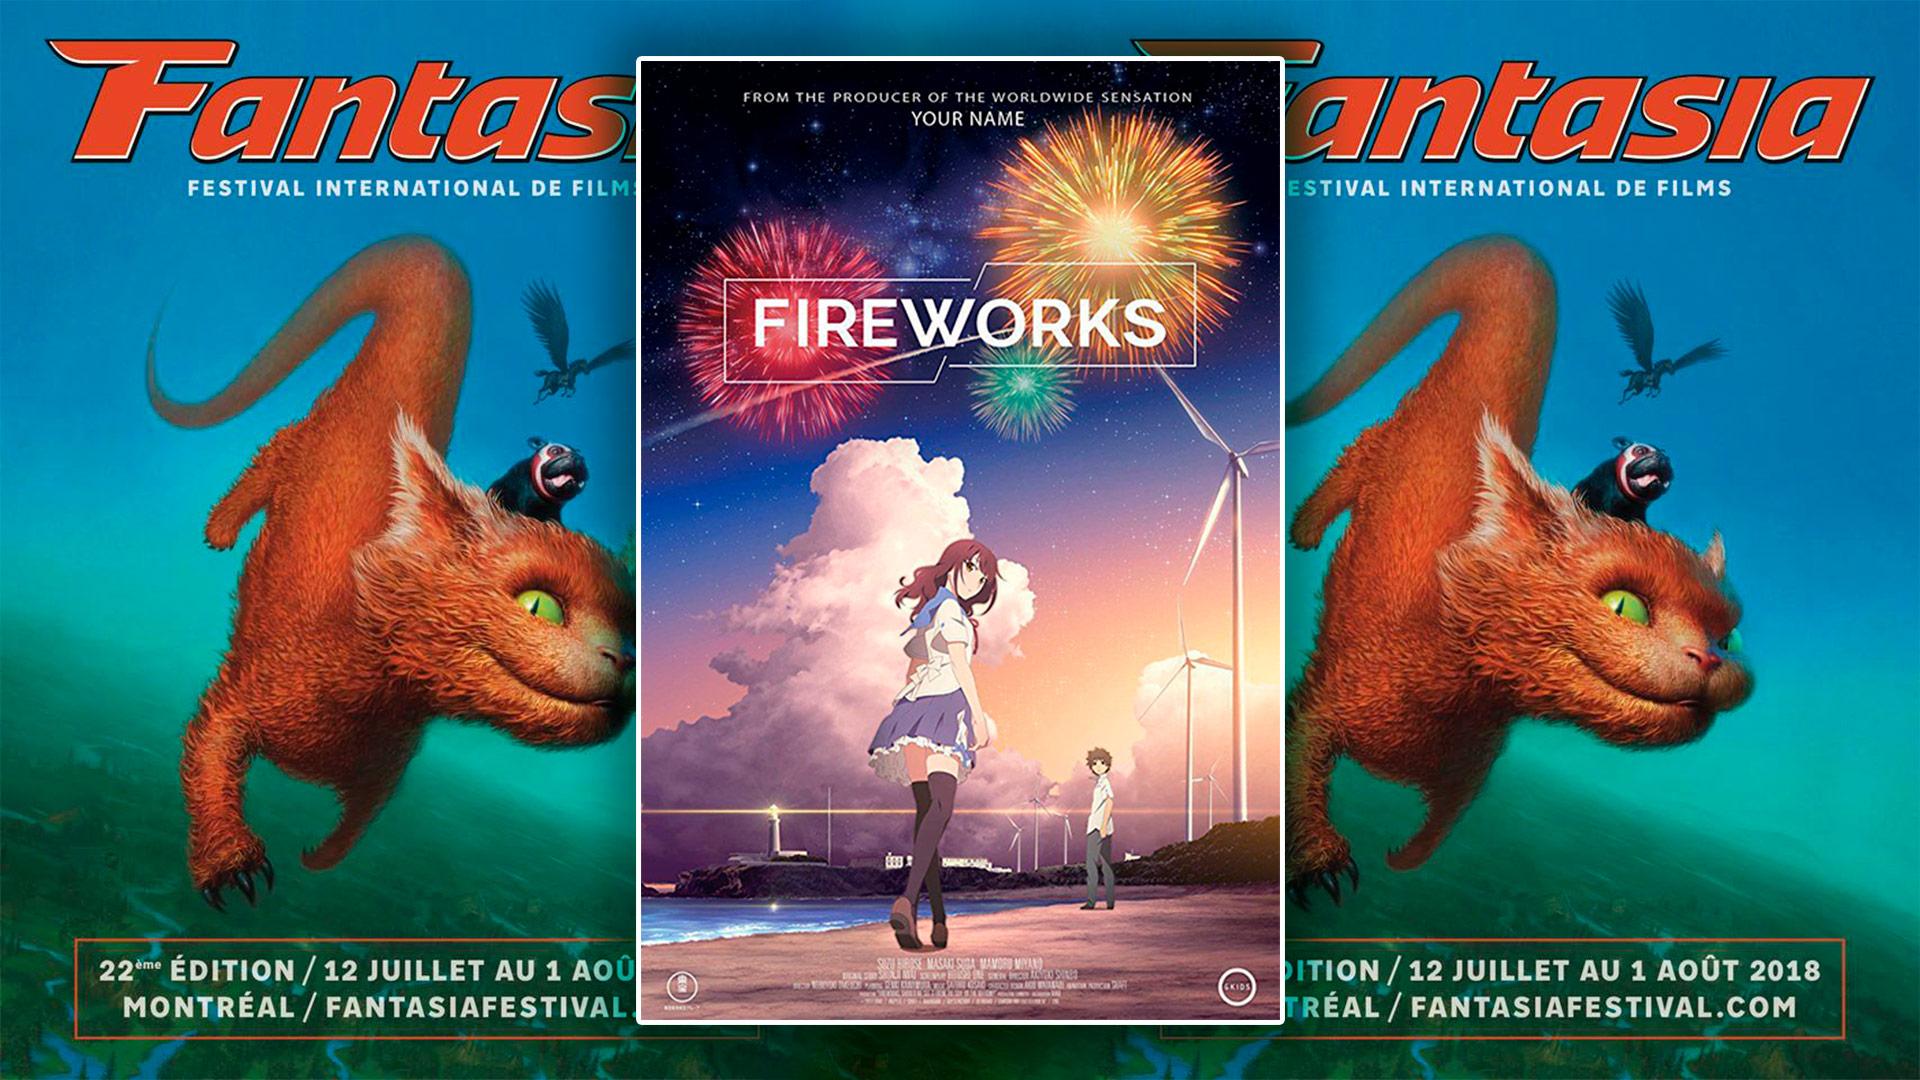 [Fantasia 2018] Critique du film Fireworks